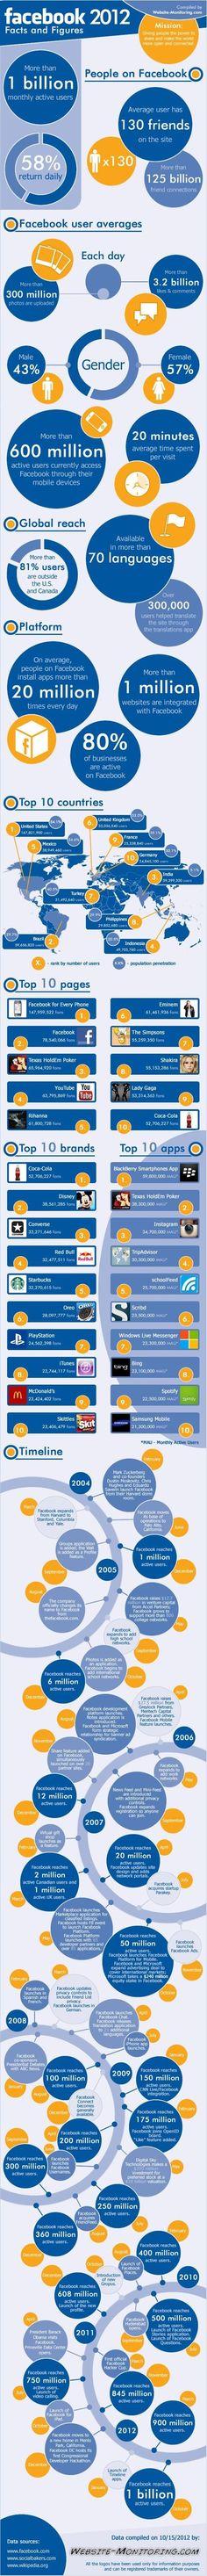 eccf806ad4781c Facebook 2012 Facts and figures.  infografia  infographic  SocialMedia  Marketing Digital, Internet